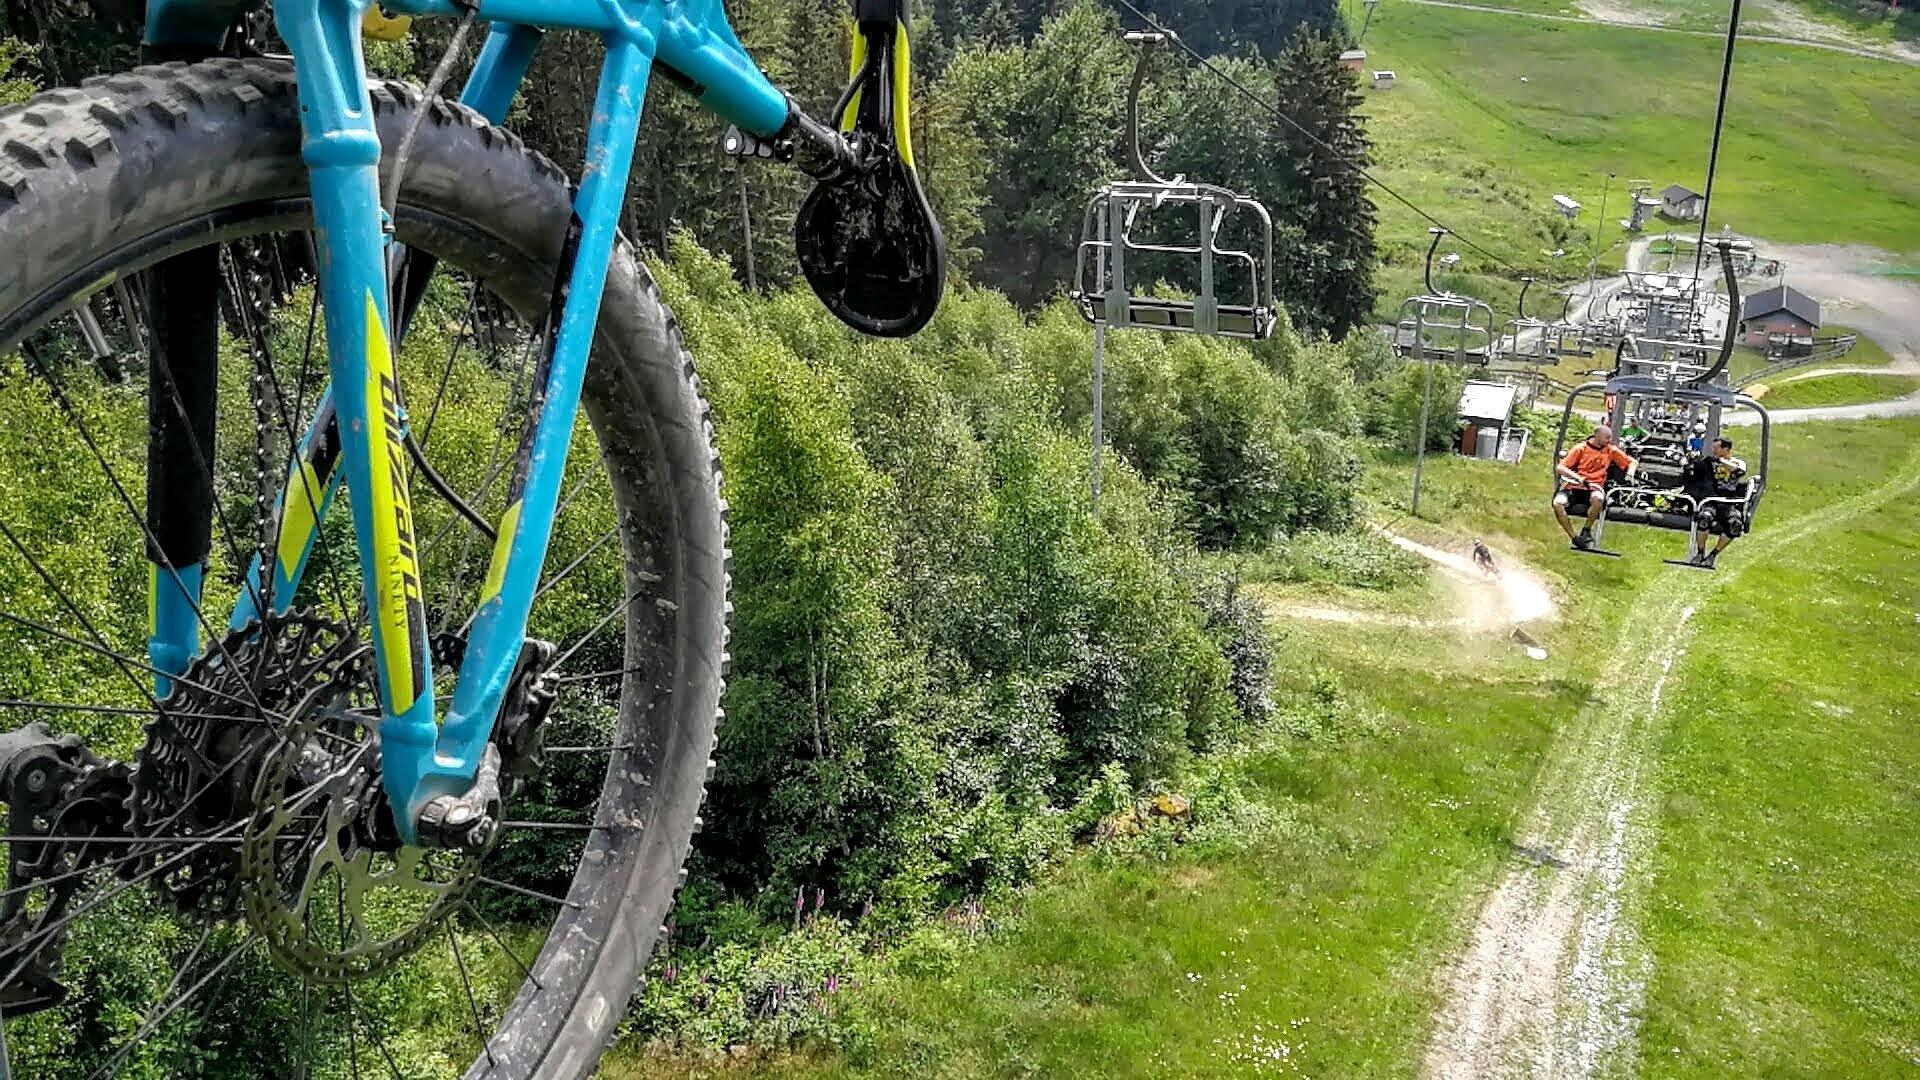 Bikepark Bikewelt Shöneck